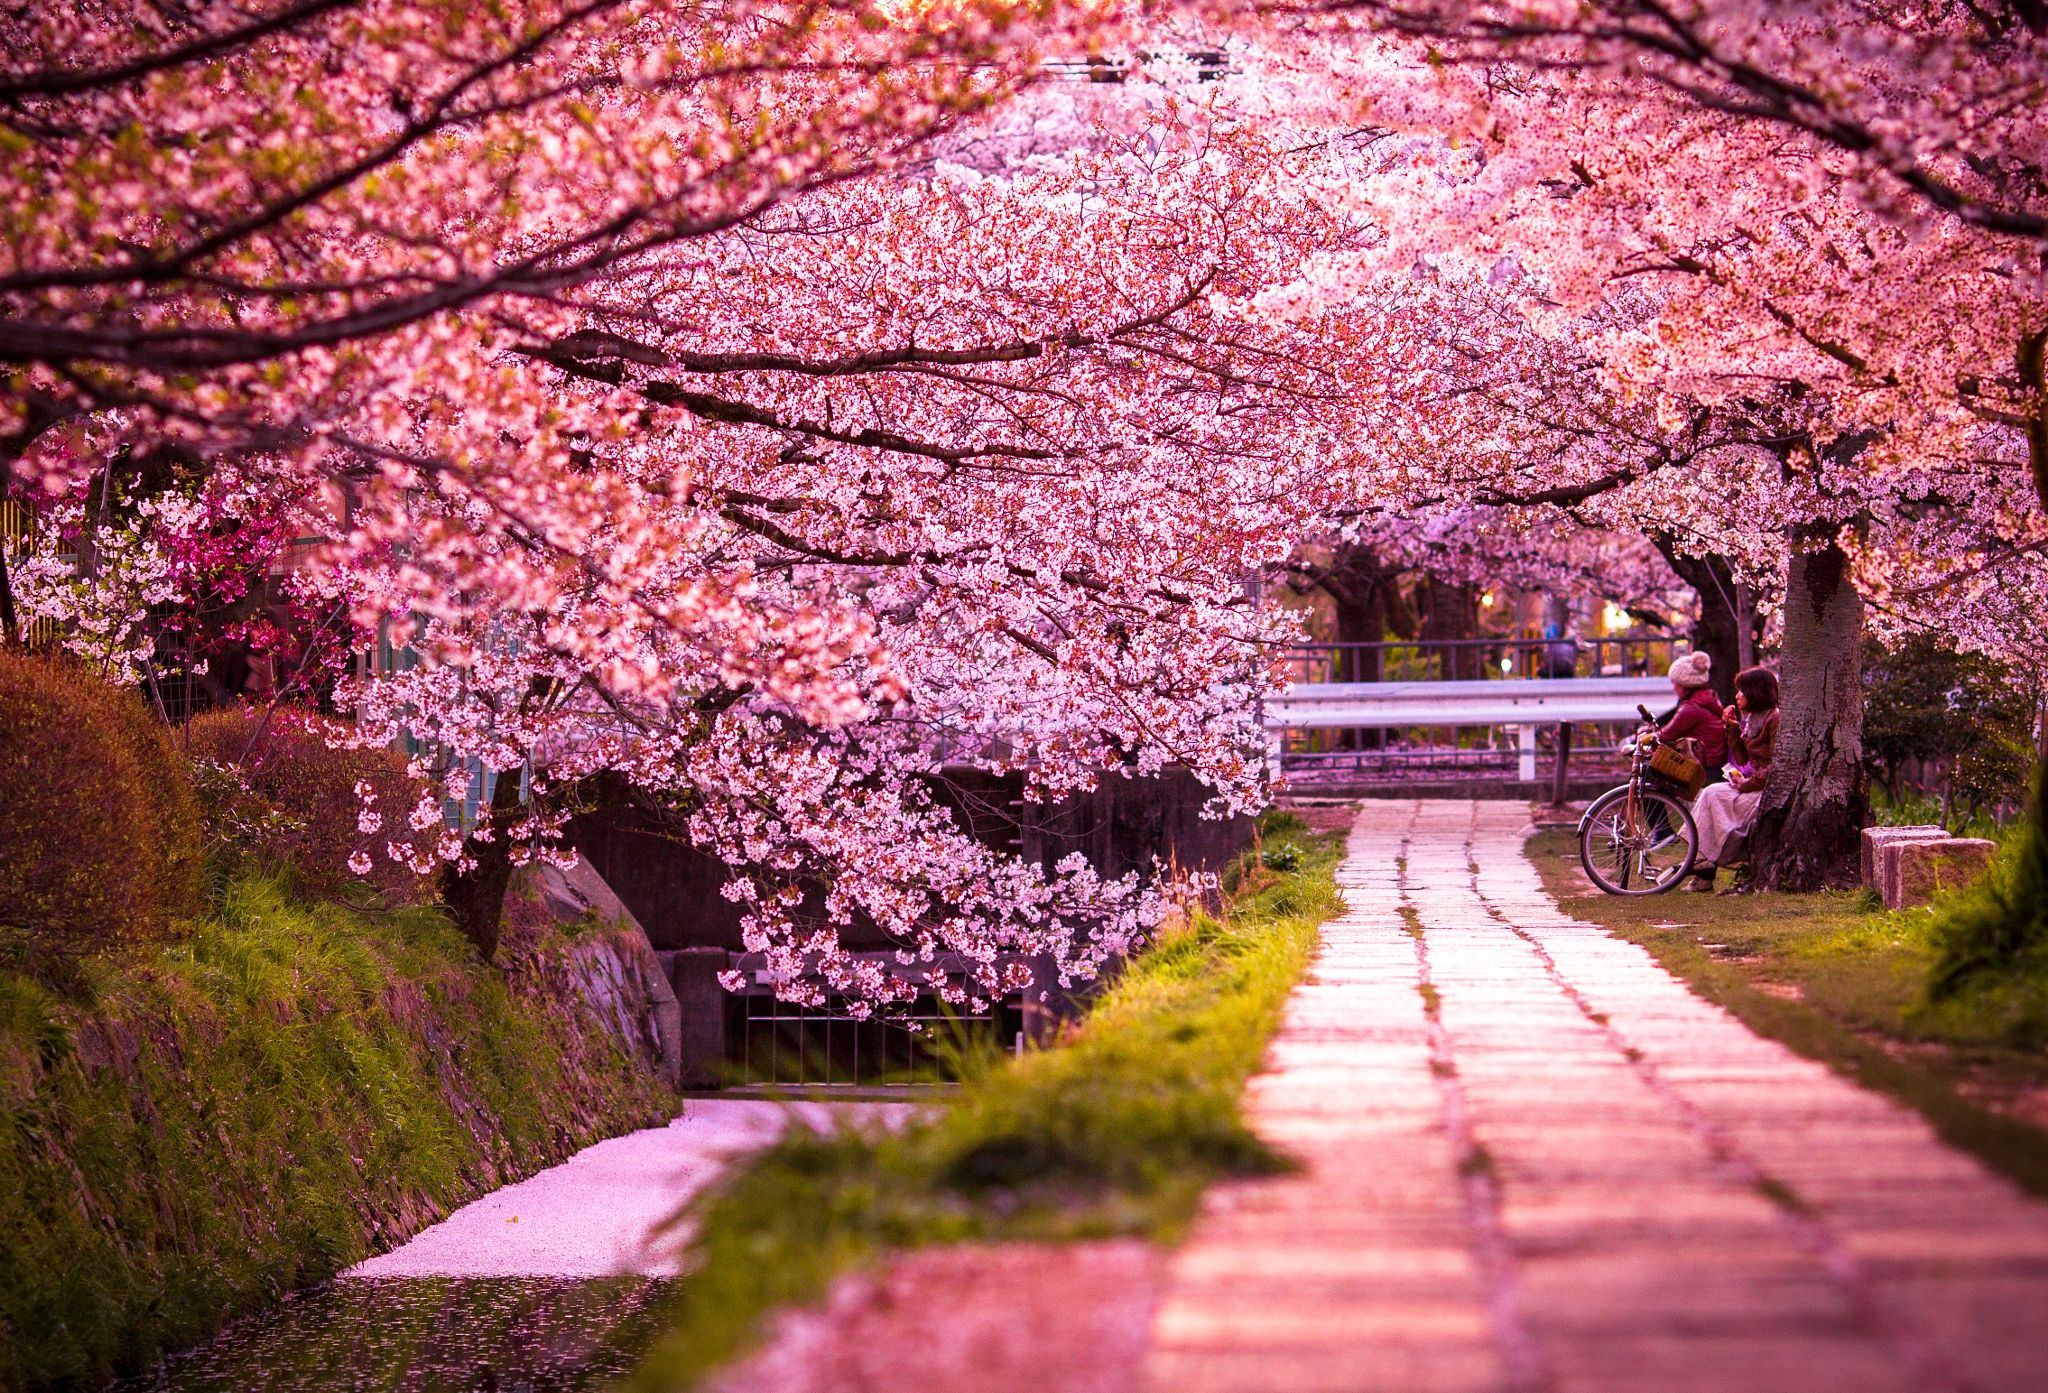 Philosopher S Path Cherry Blossom Festival Beautiful Streets Japanese Cherry Blossom